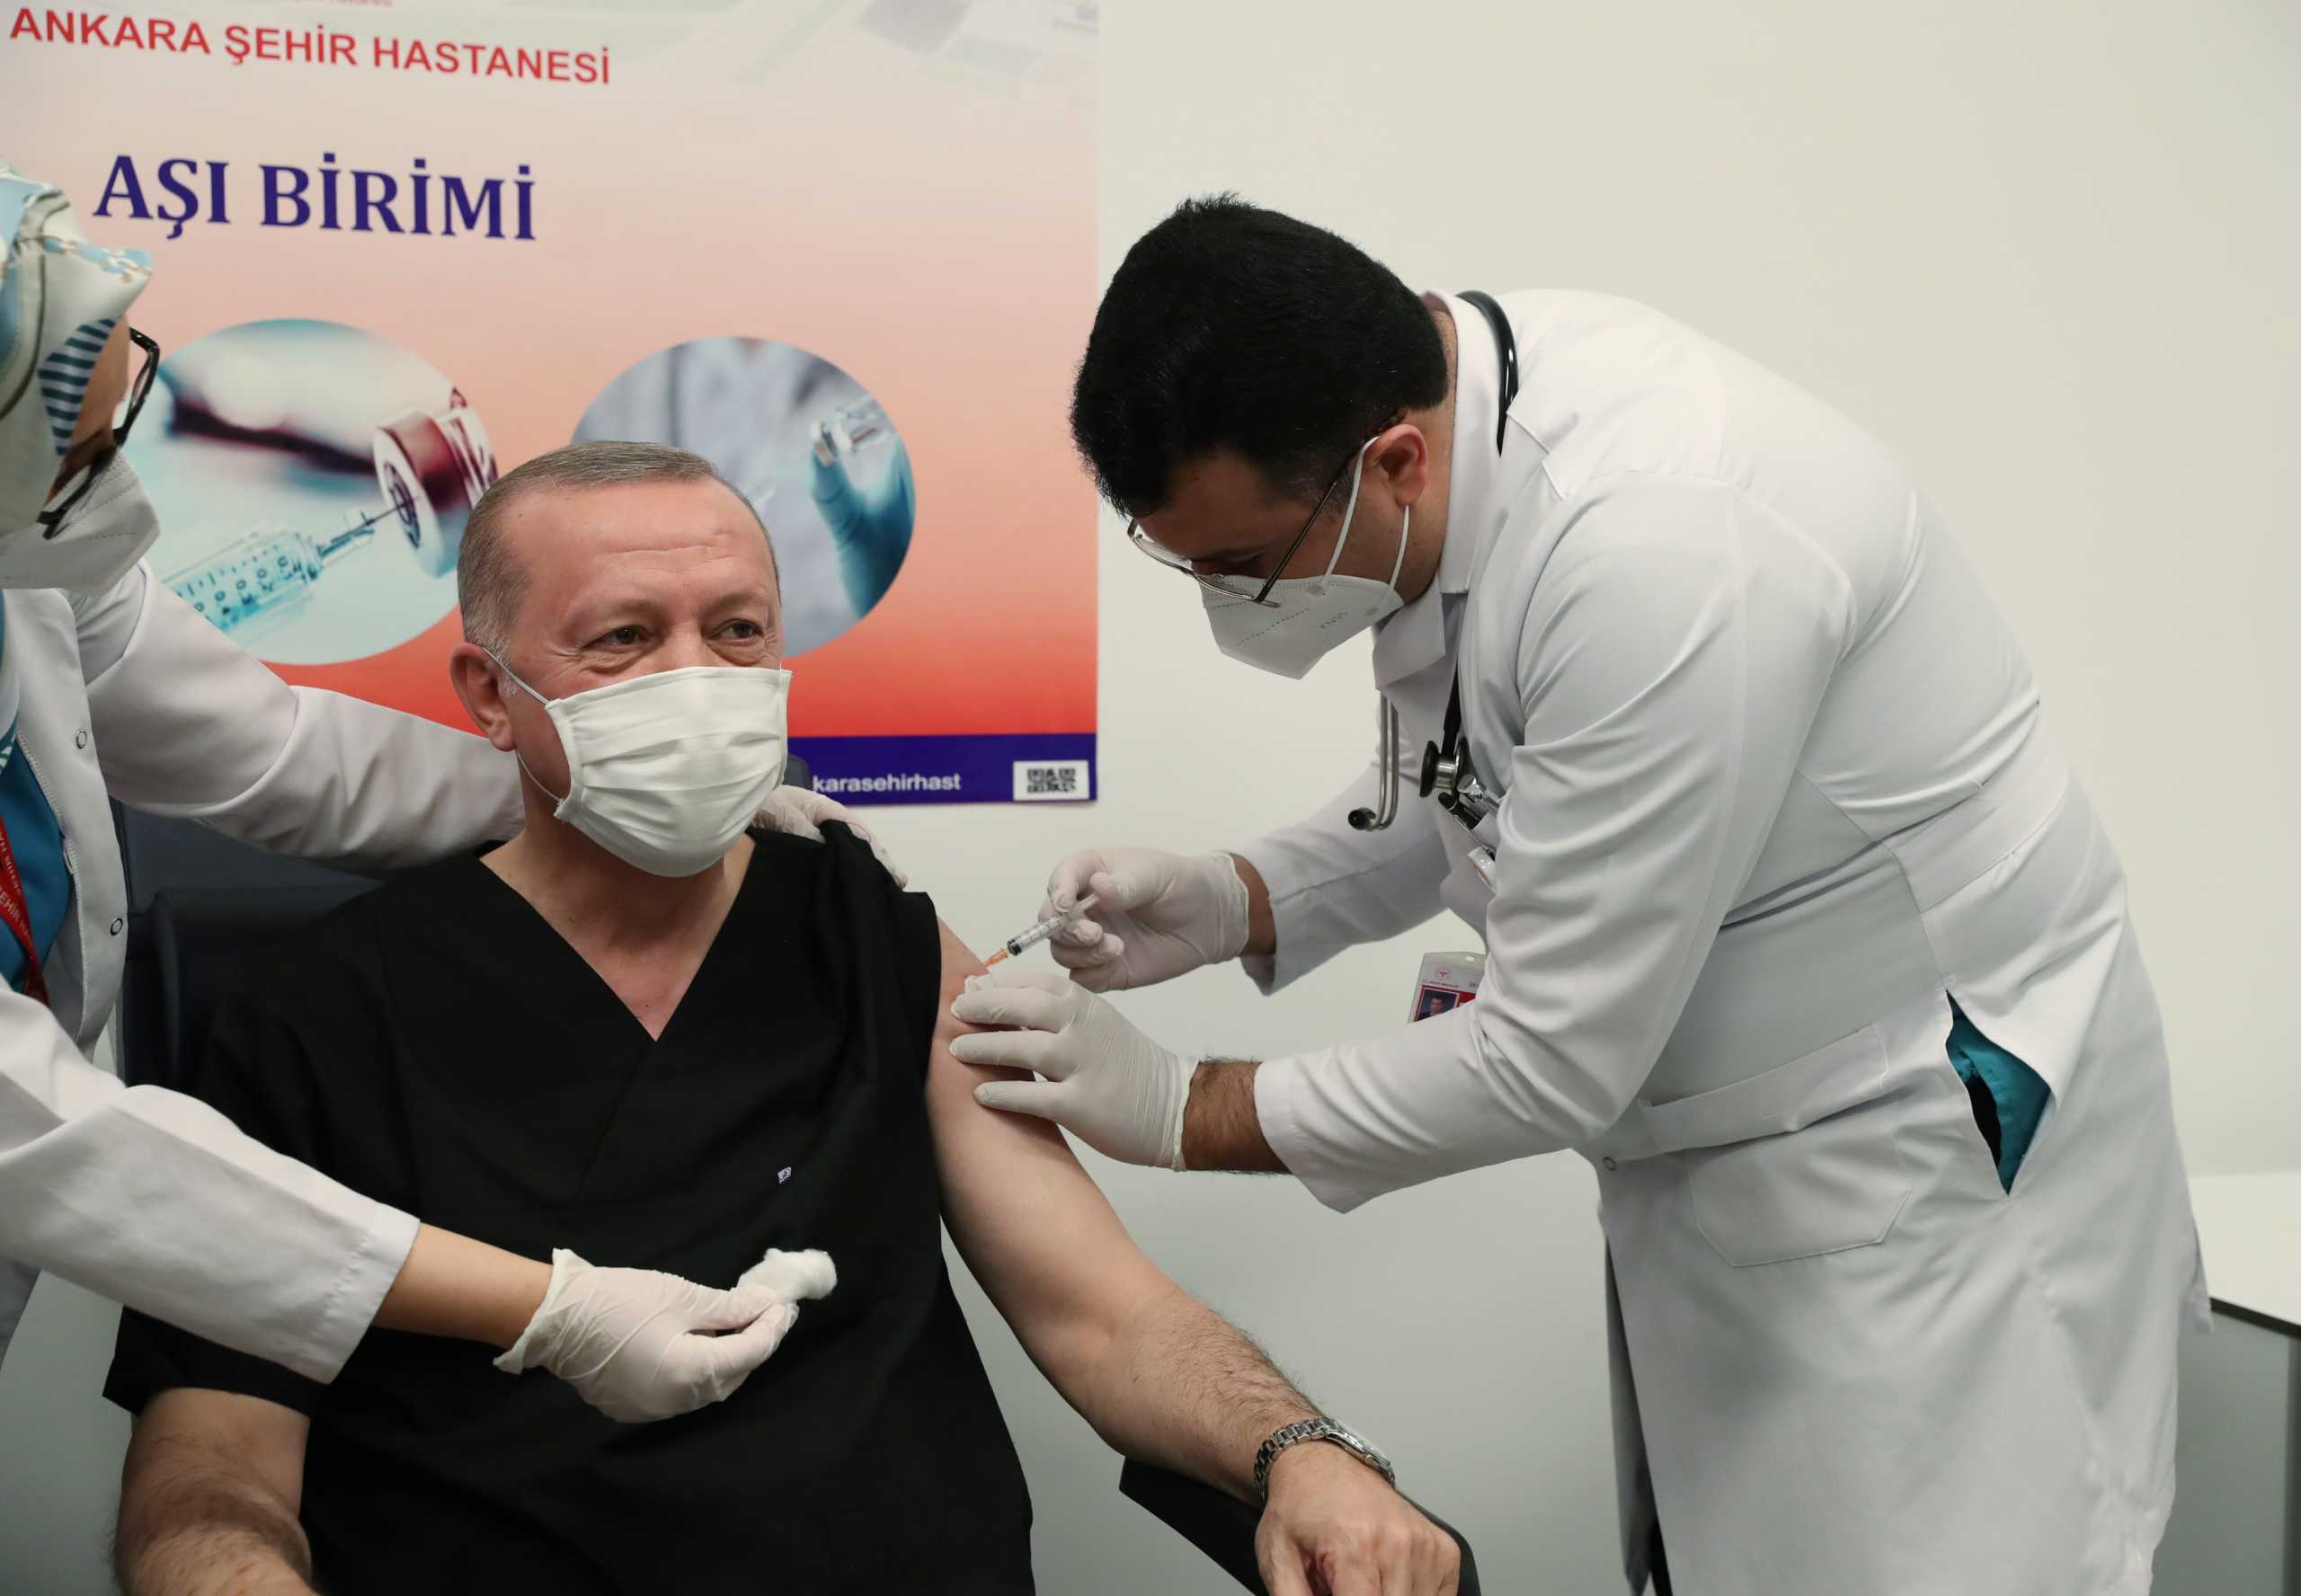 Show και στο νοσοκομείο: Ο Ερντογάν έκανε το εμβόλιο του κορονοϊού